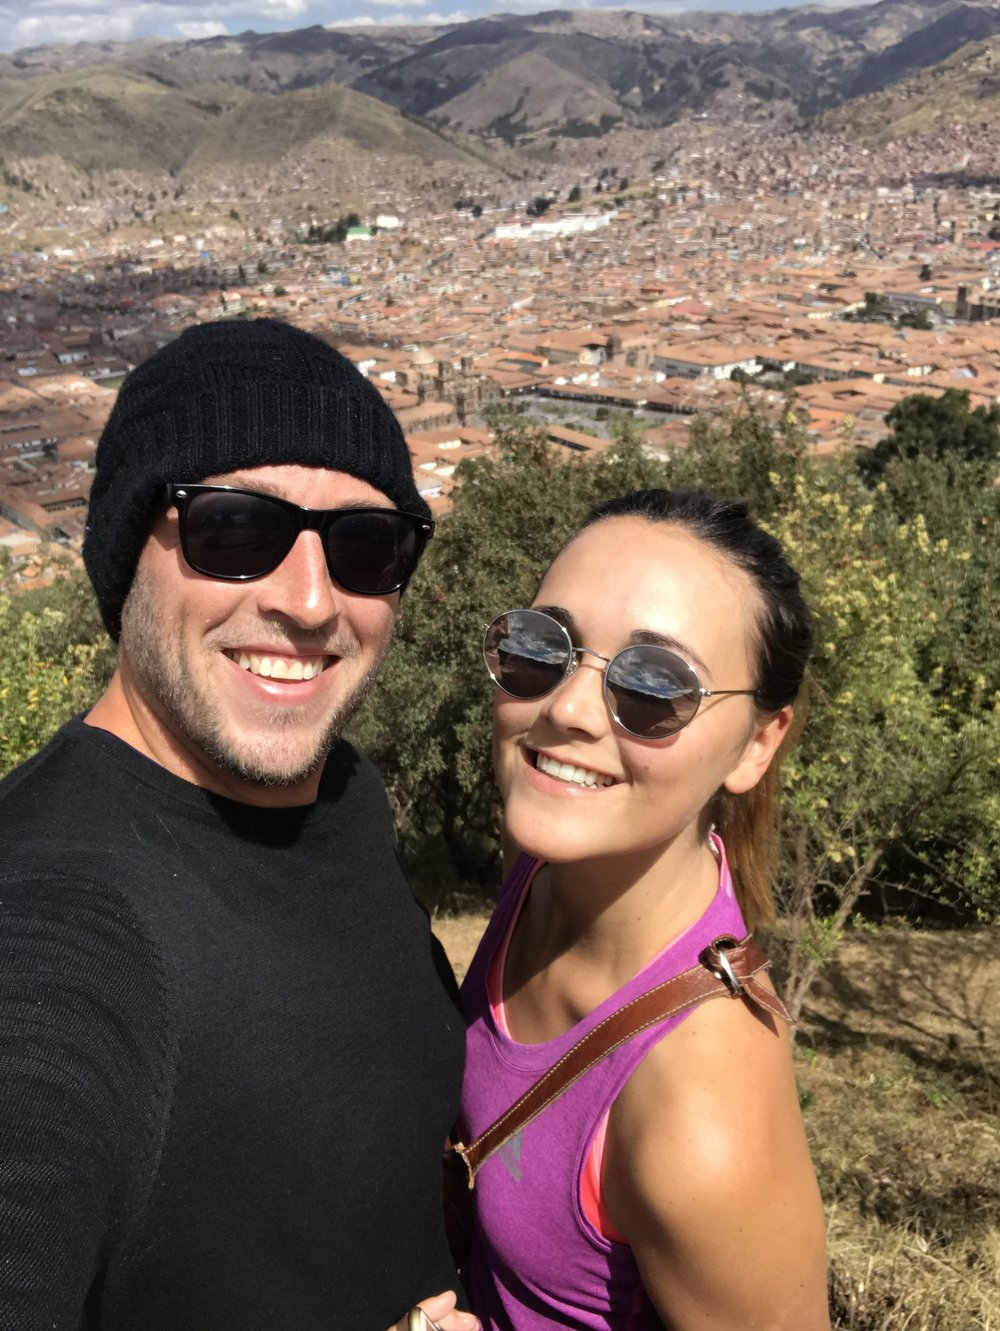 48 Hours in Cusco: Plaza De Armas, San Pedro market and Pisco Sours